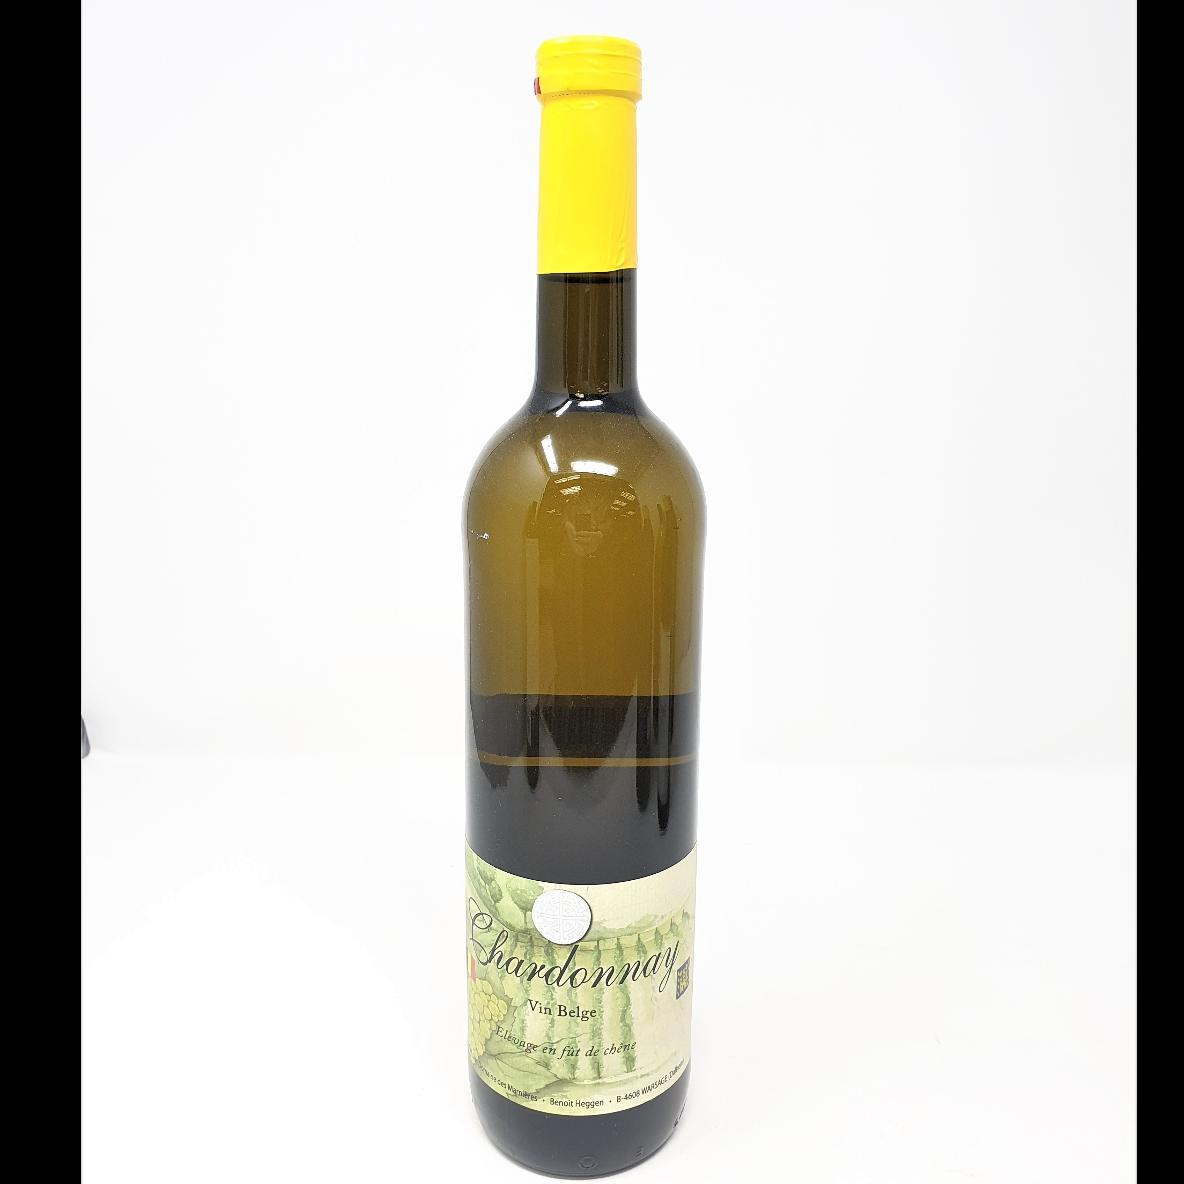 Chardonnay Marnières 2018 75cl